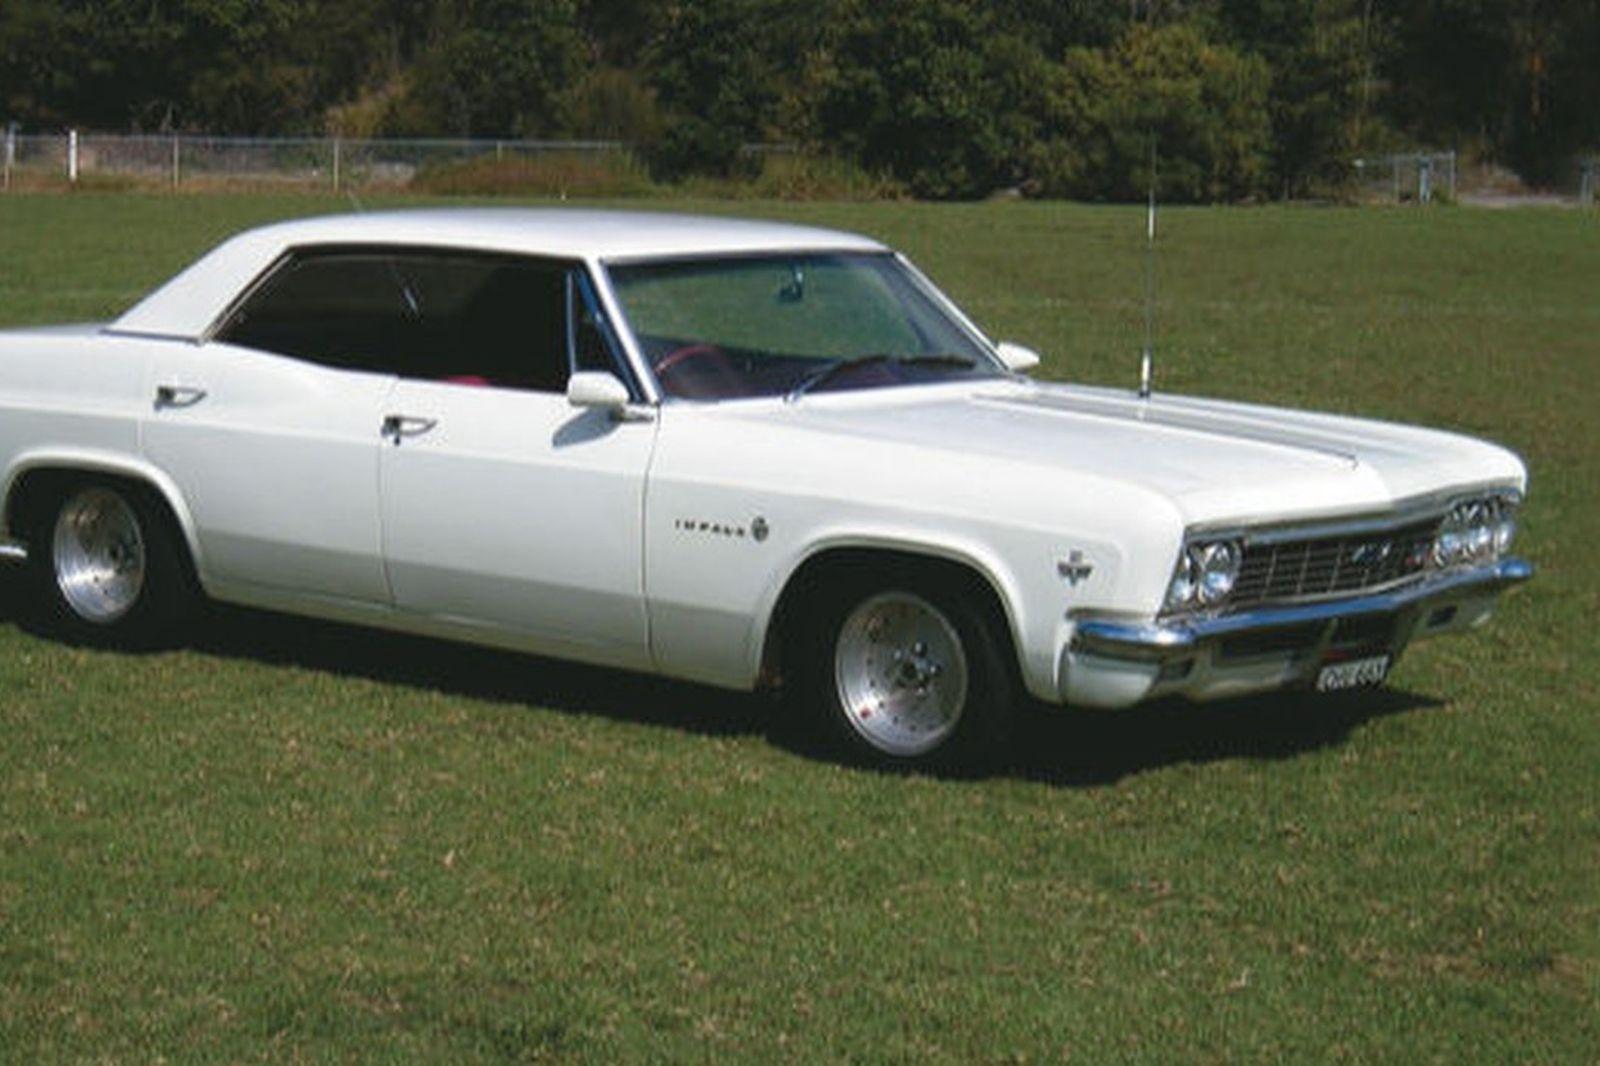 Sold Chevrolet Impala Pillarless Sedan Auctions Lot 26 Shannons 1966 Bel Air Rear View